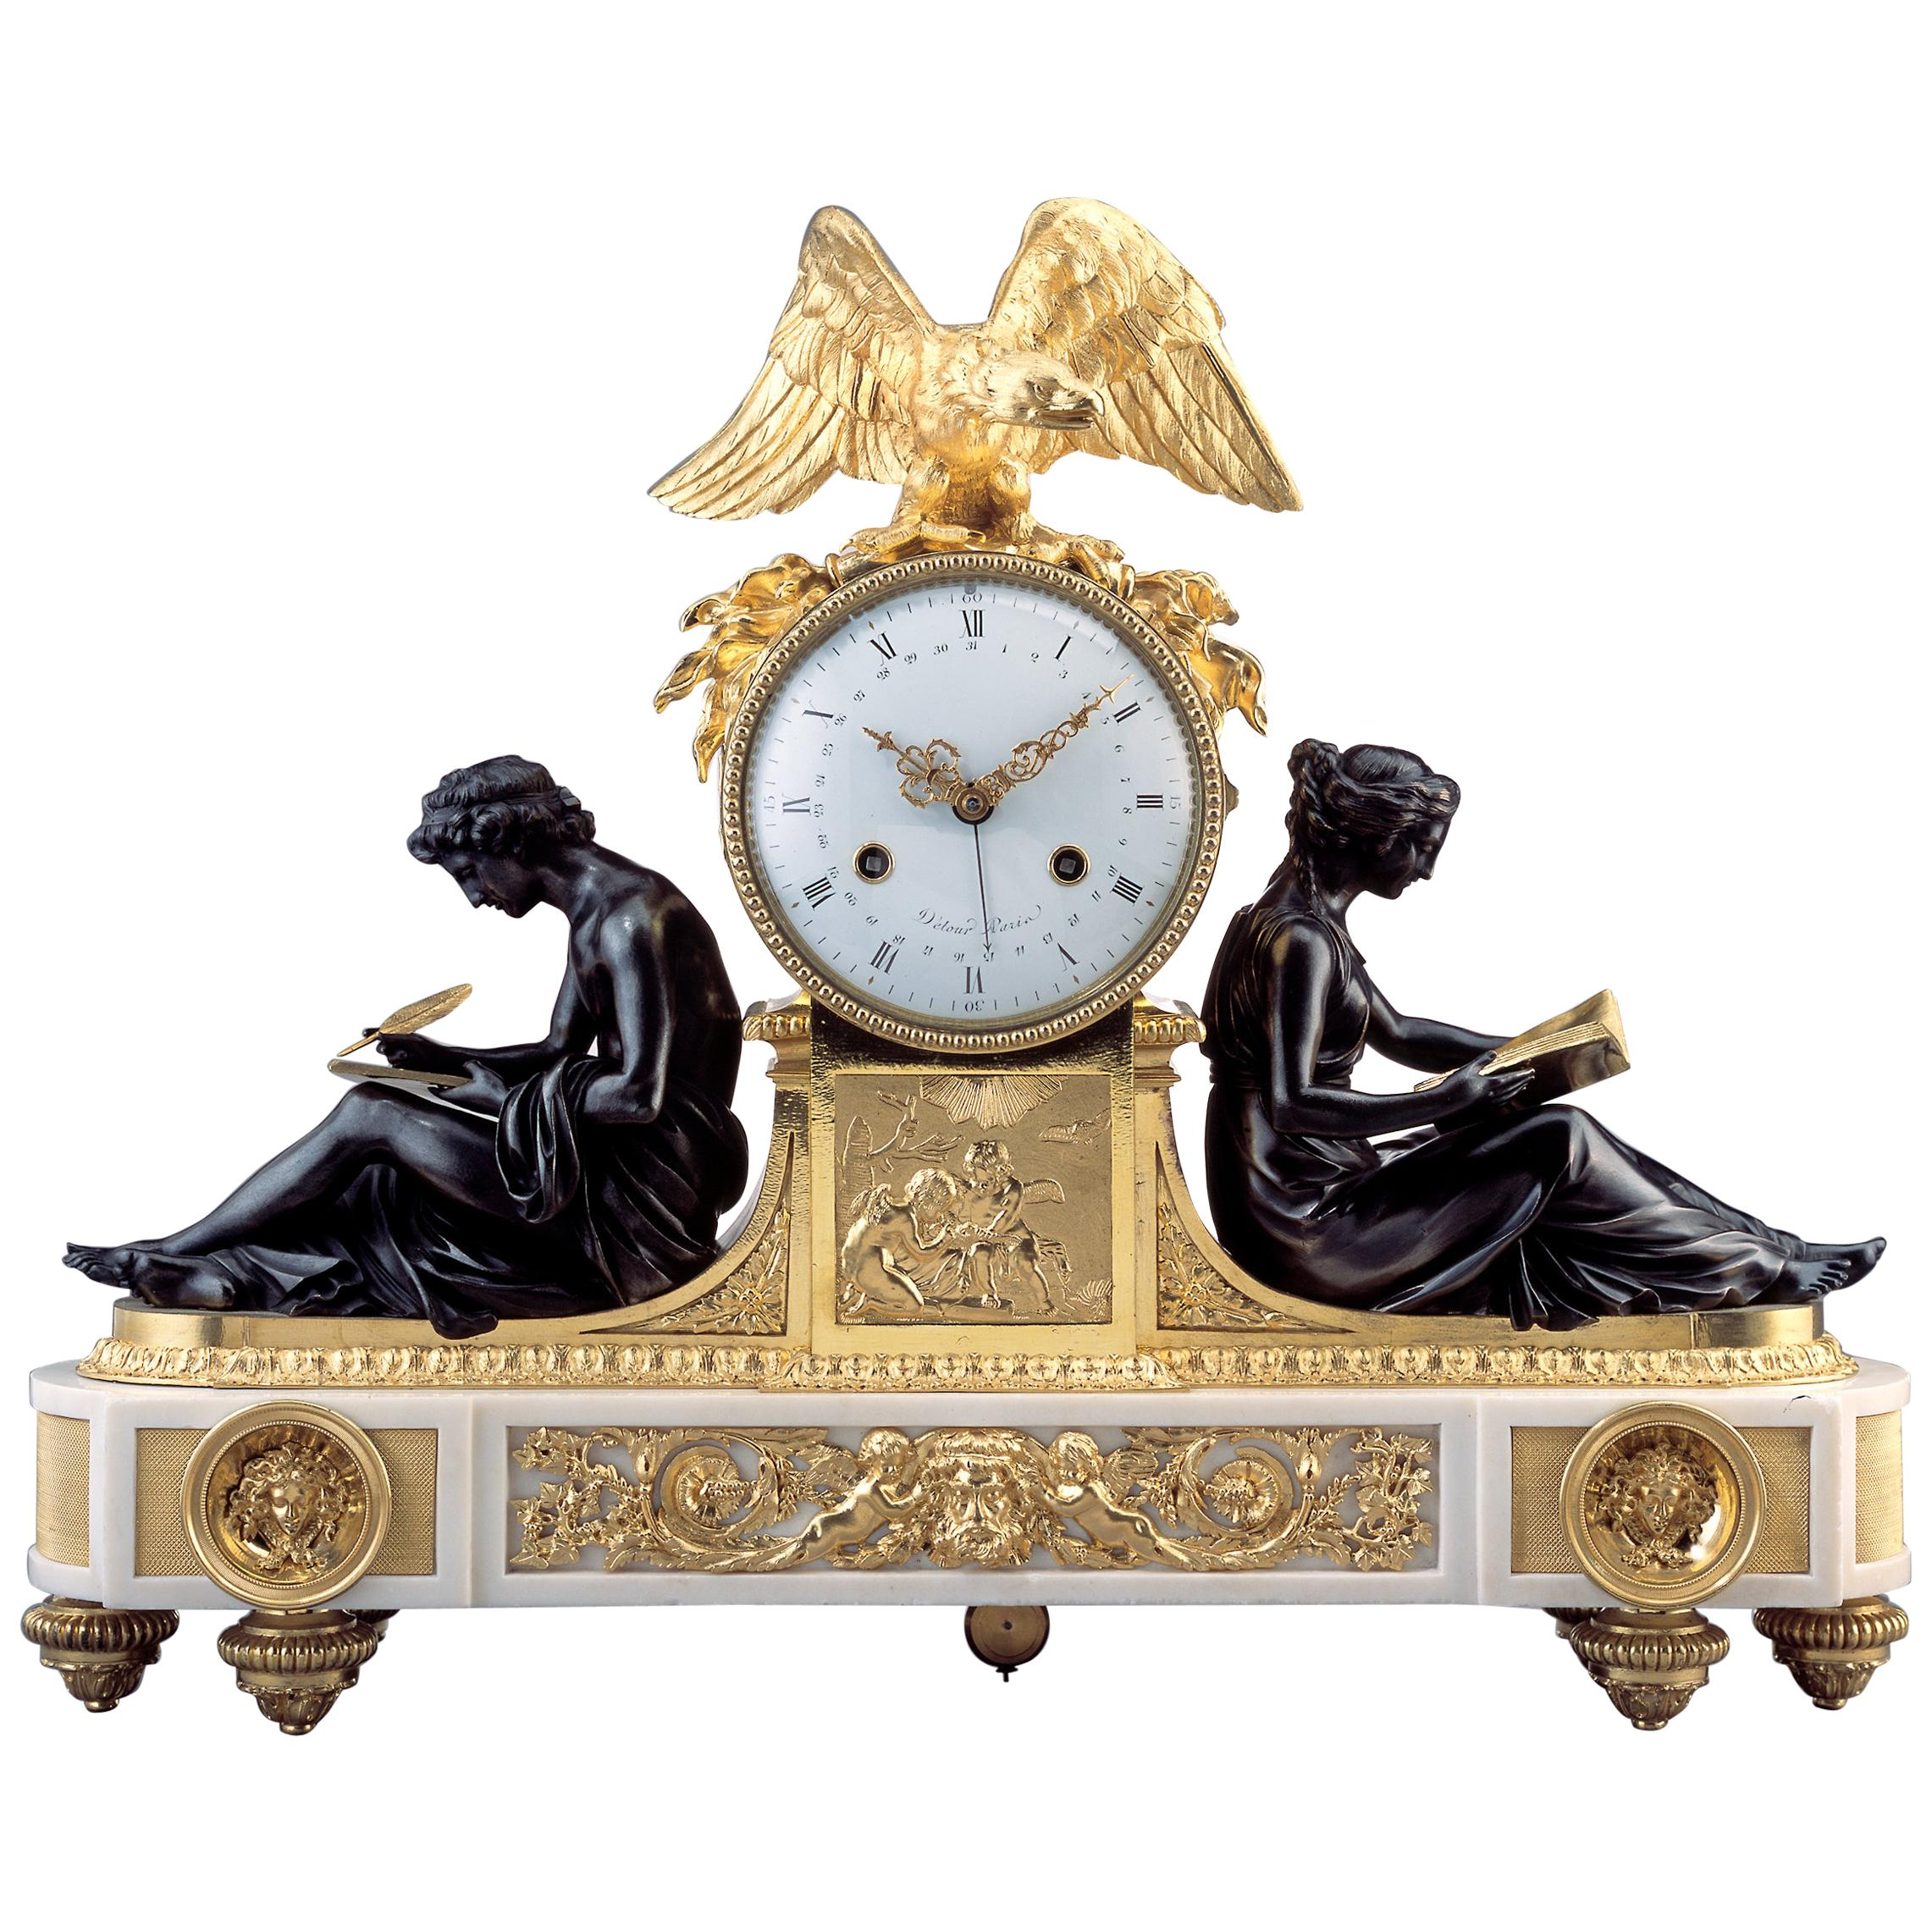 Rare Late 18th Century Neoclassical Louis XVI Ormolu Mantel Clock